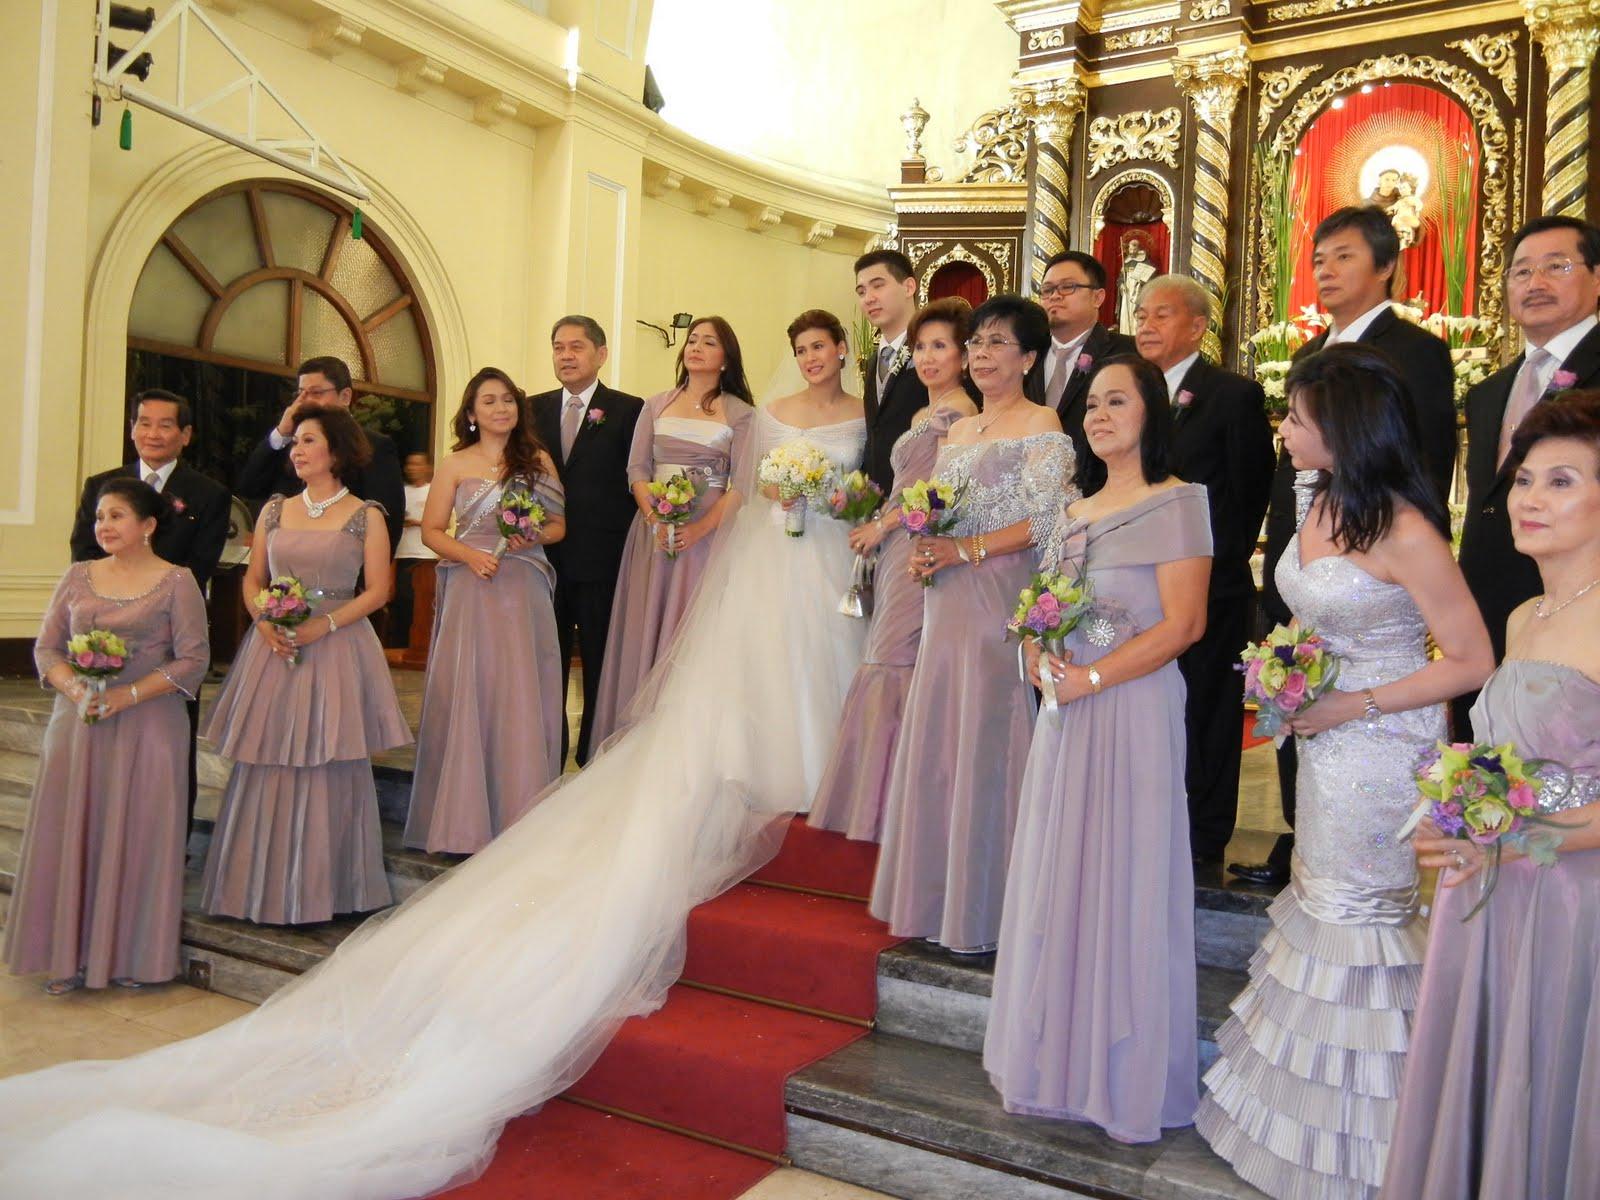 The Wedding Enthusiast January 2011